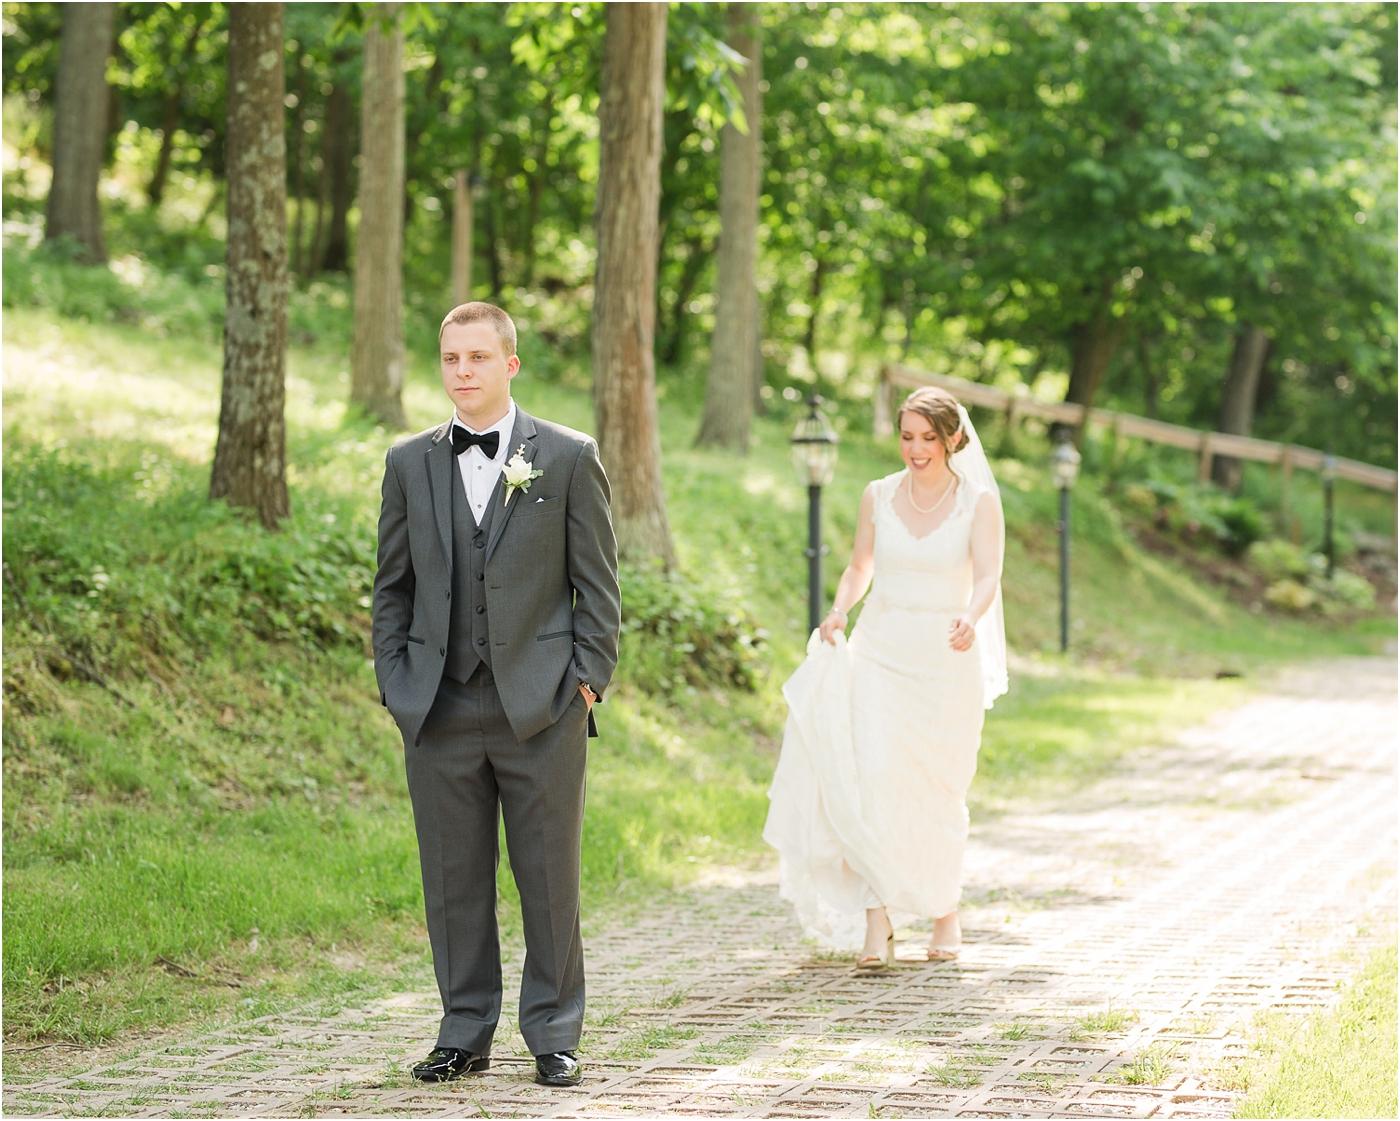 Gettysburg-lodges-wedding-photos-32.jpg